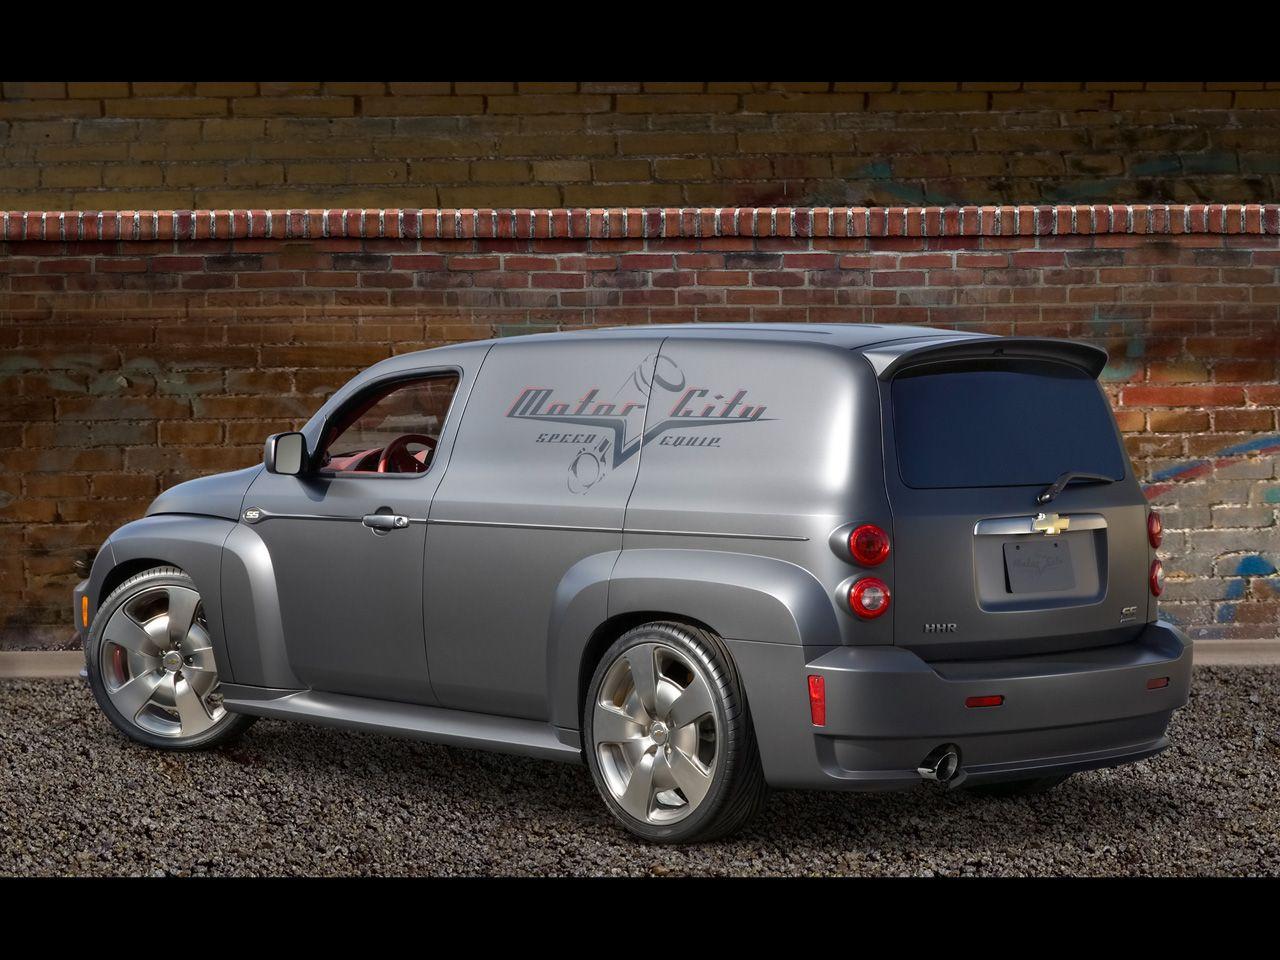 All Chevy 2010 chevy hhr problems : Chevy HHR | blender | Pinterest | Chevy hhr, Cars and Chevrolet